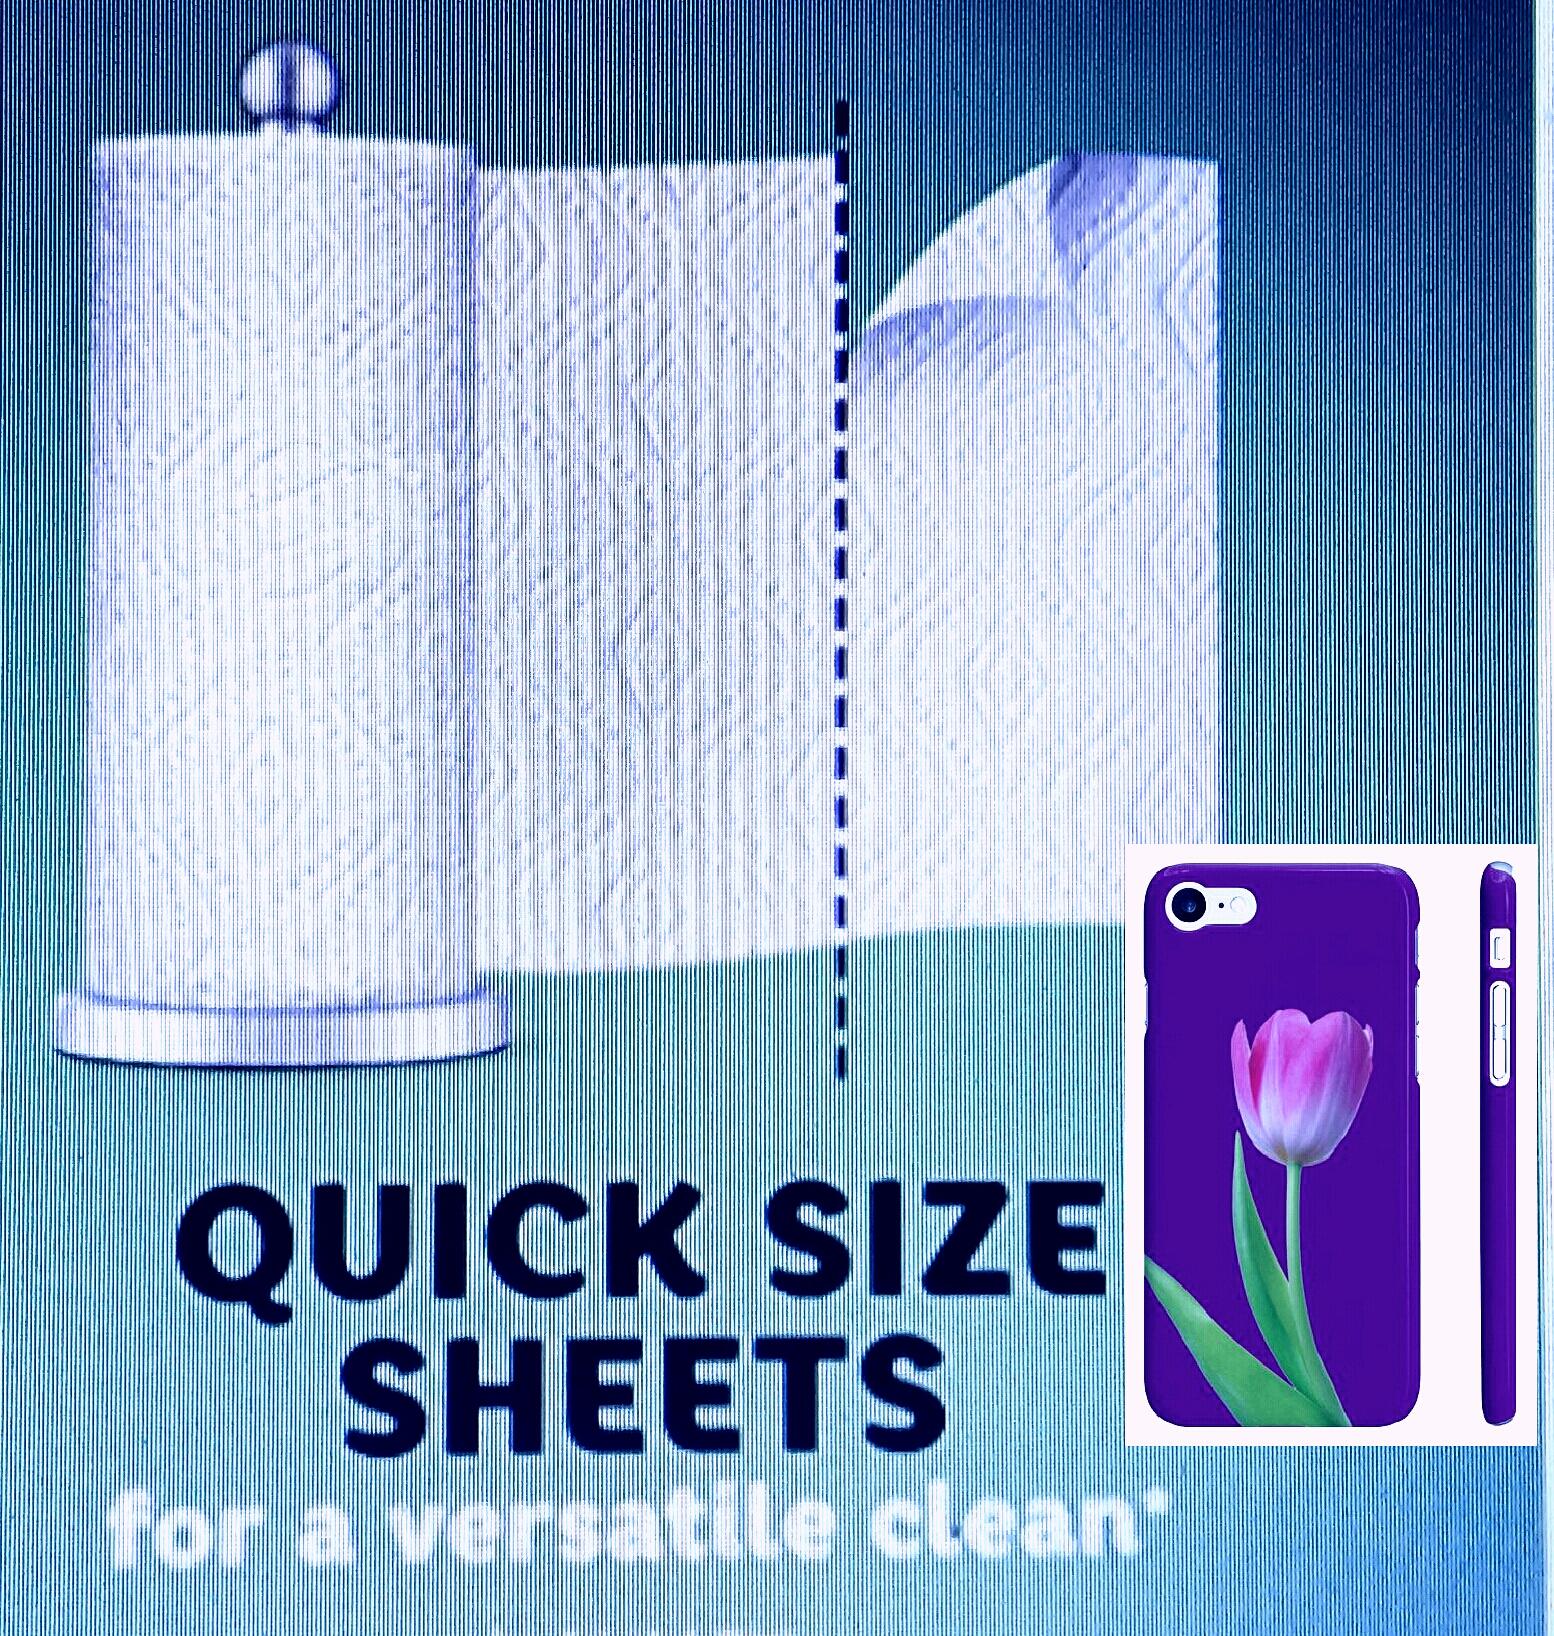 kertas tisu saiz besar pengganti kain dapur pakaibuang